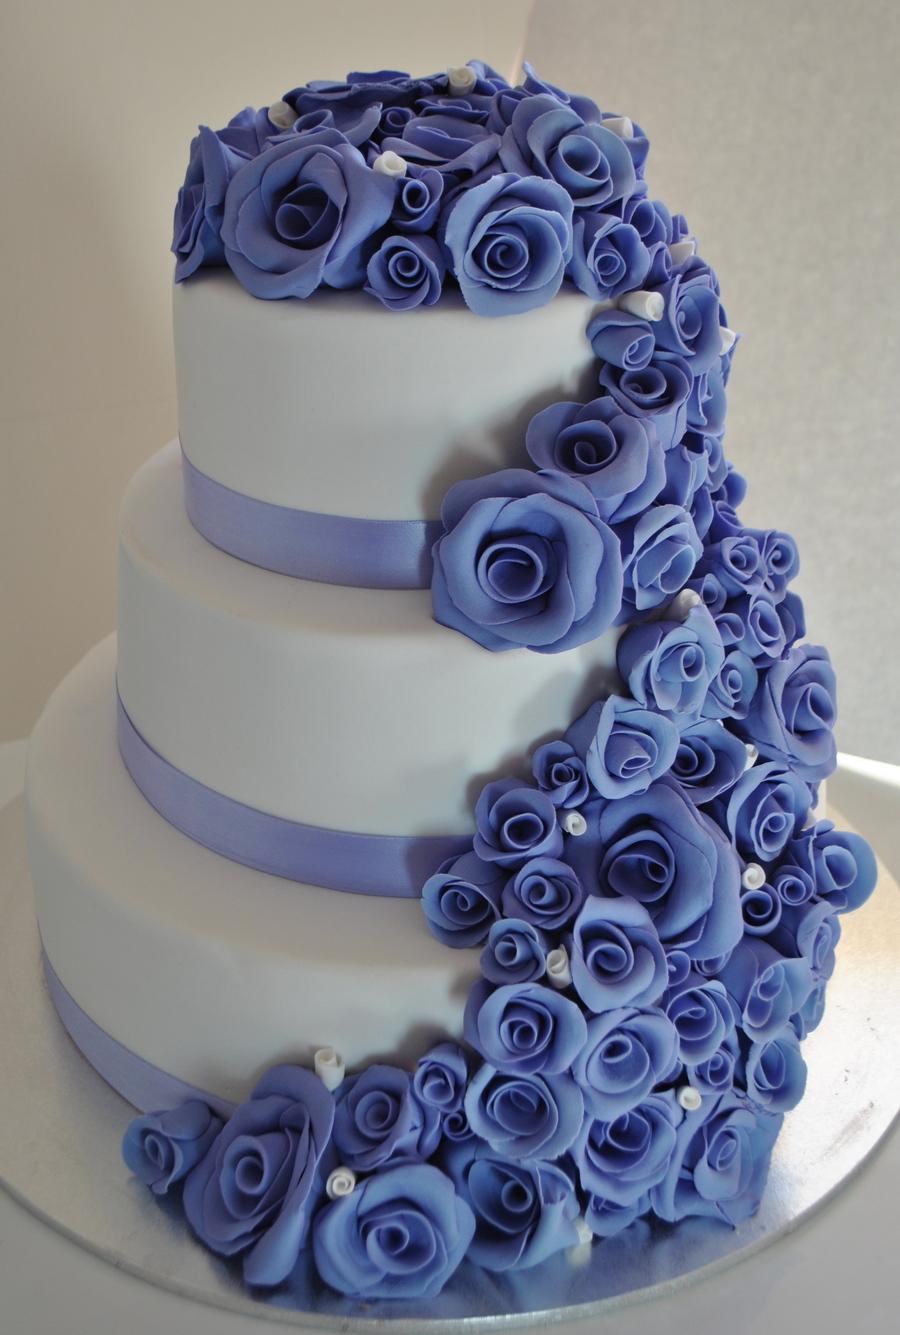 Purple Mauve Wedding Cake With Handmade Roses